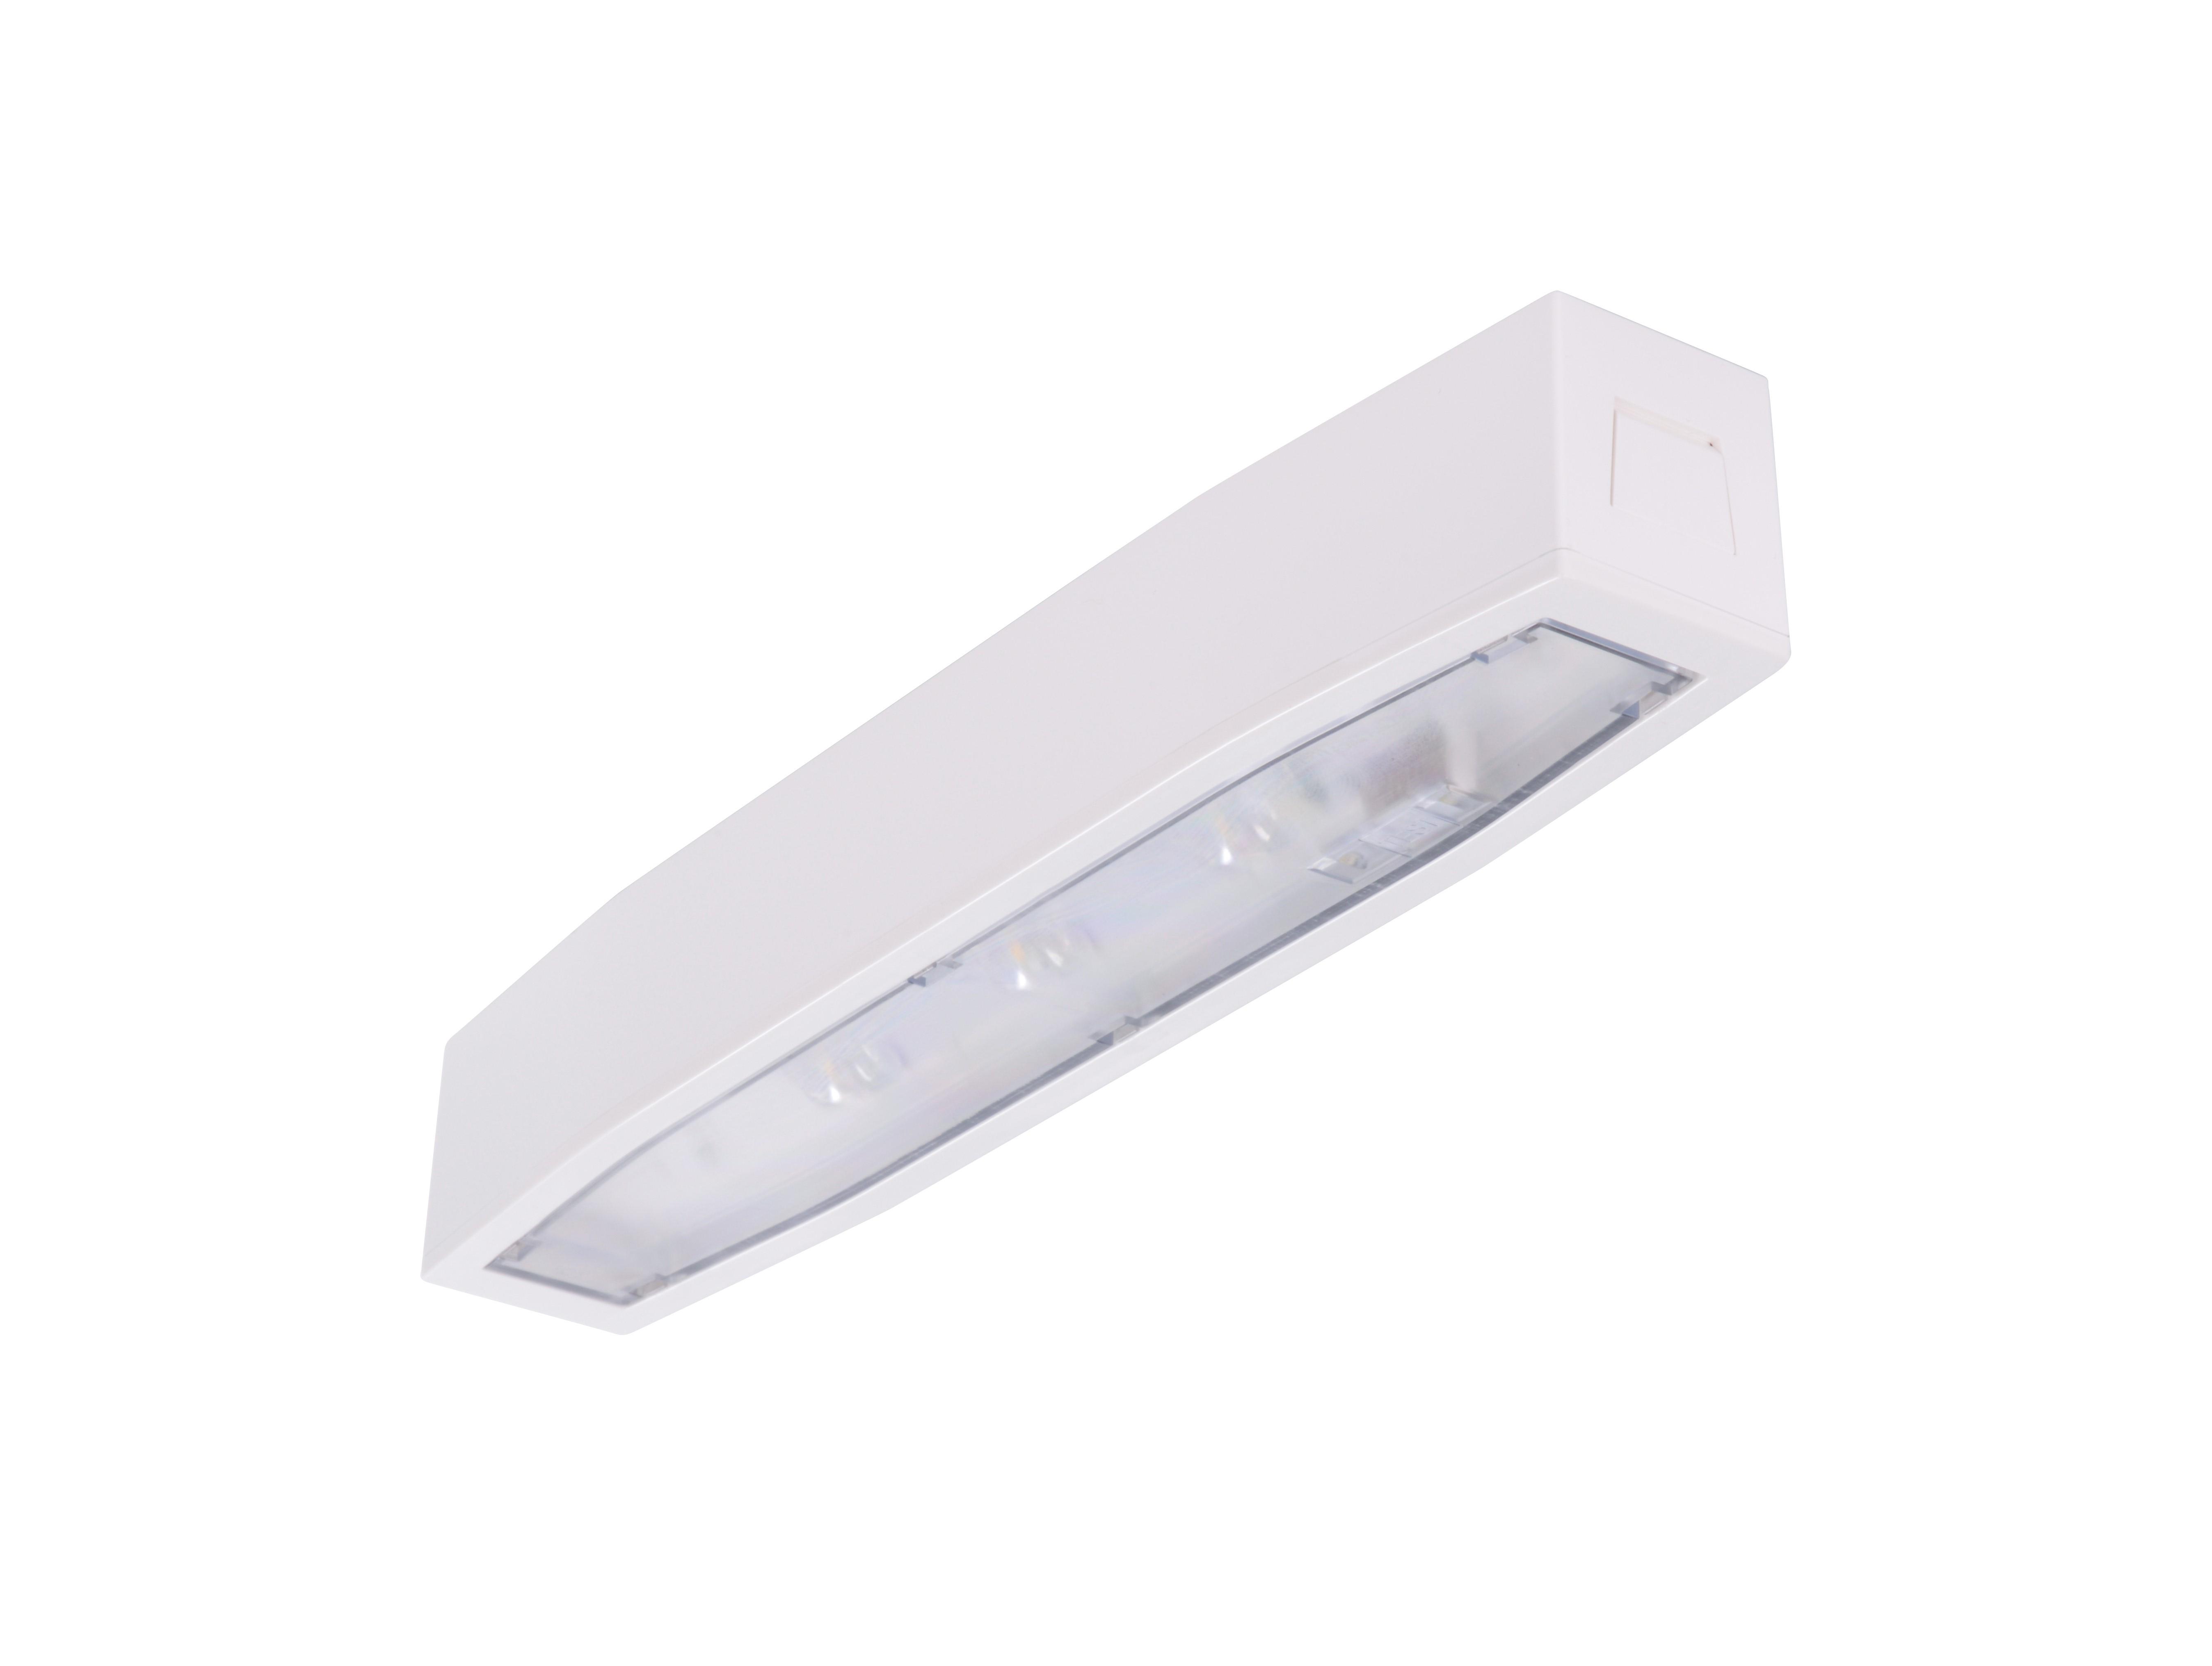 Lampa emergenta led Intelight 94706   3h mentinut test automat 0